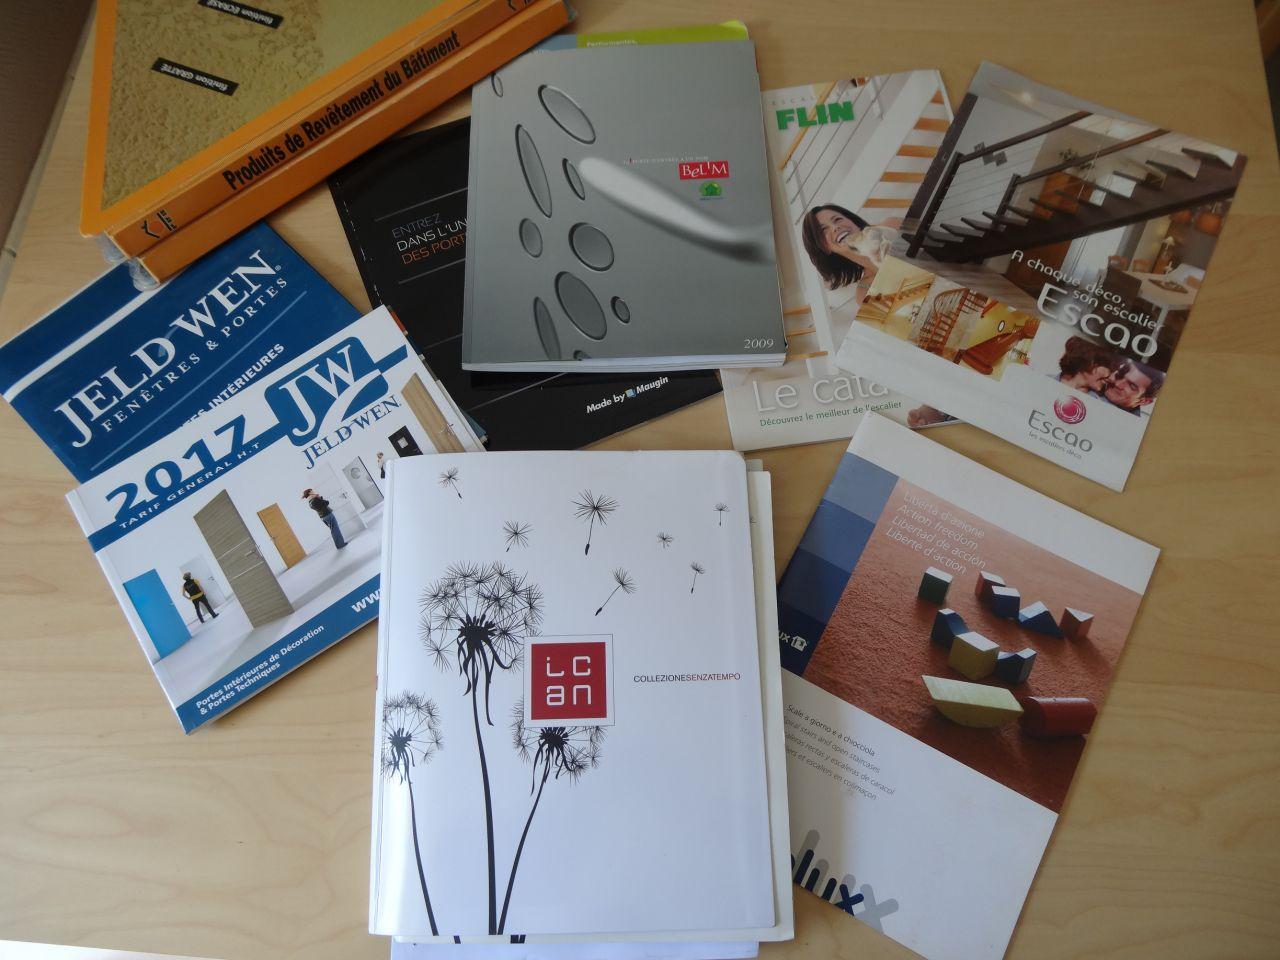 Catalogues Jeld Wen, Maugin, Bel?m, Flin, Escao, Inlux et Ican porte